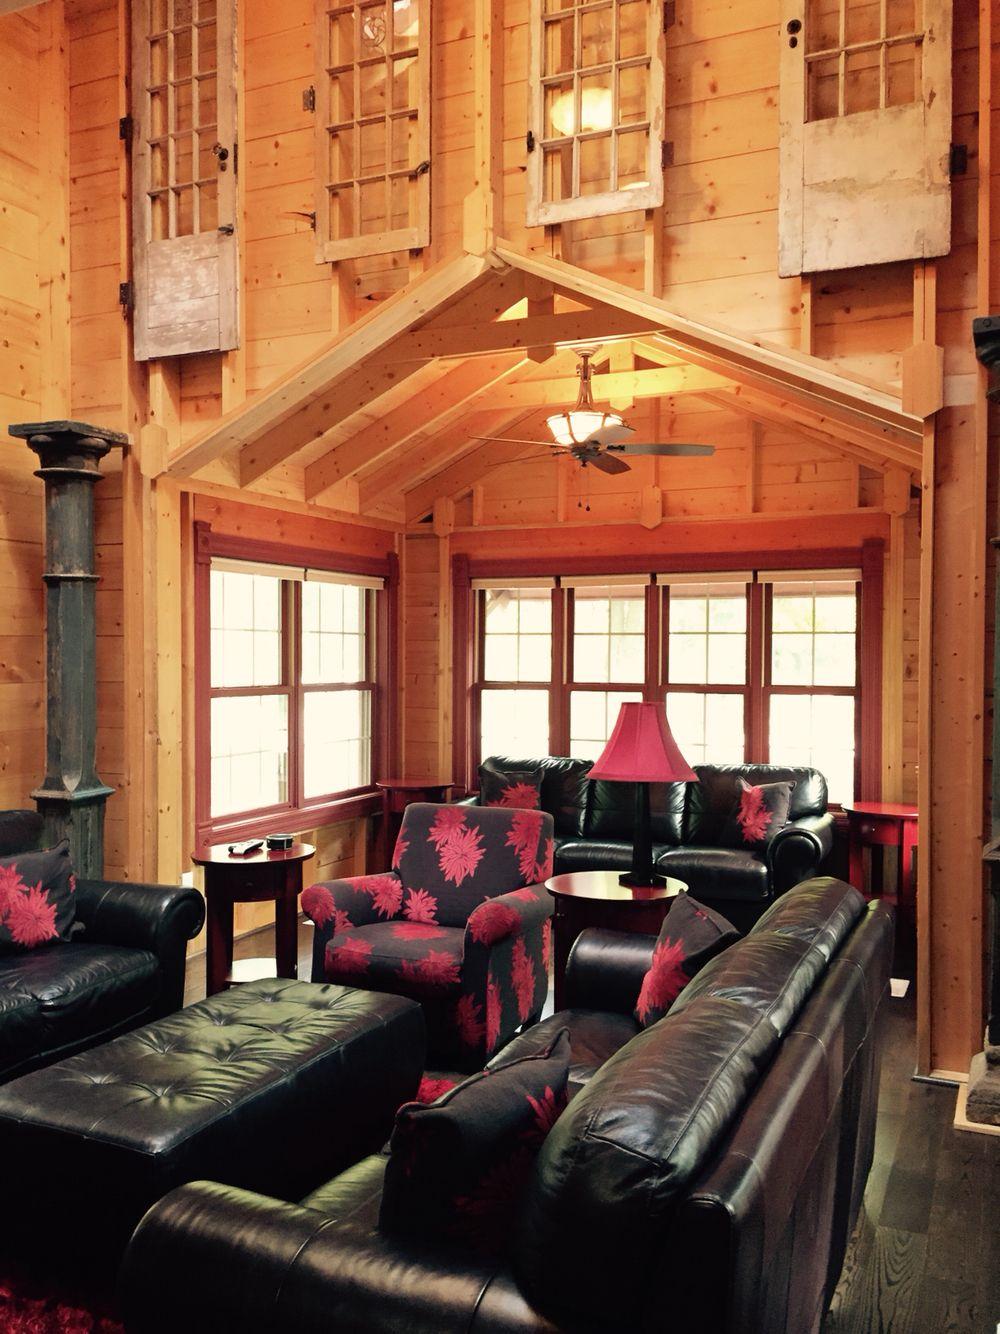 Cottage 5 living room at DollyBrook Resort near Saugatuck